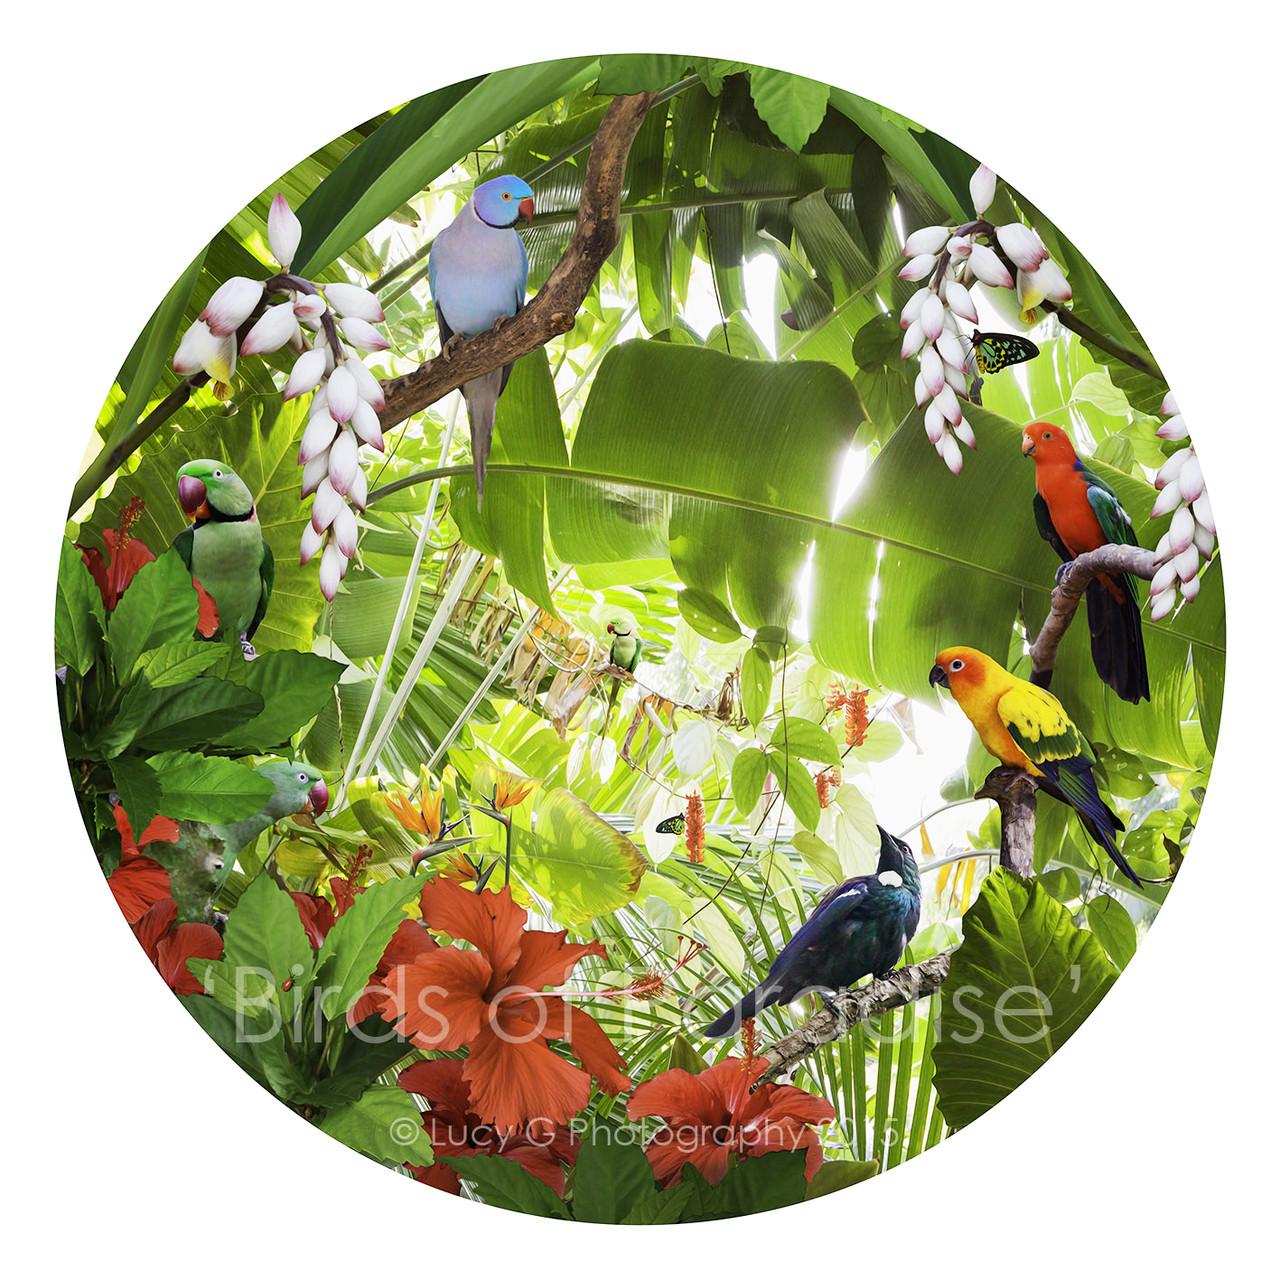 birds of paradise hook up